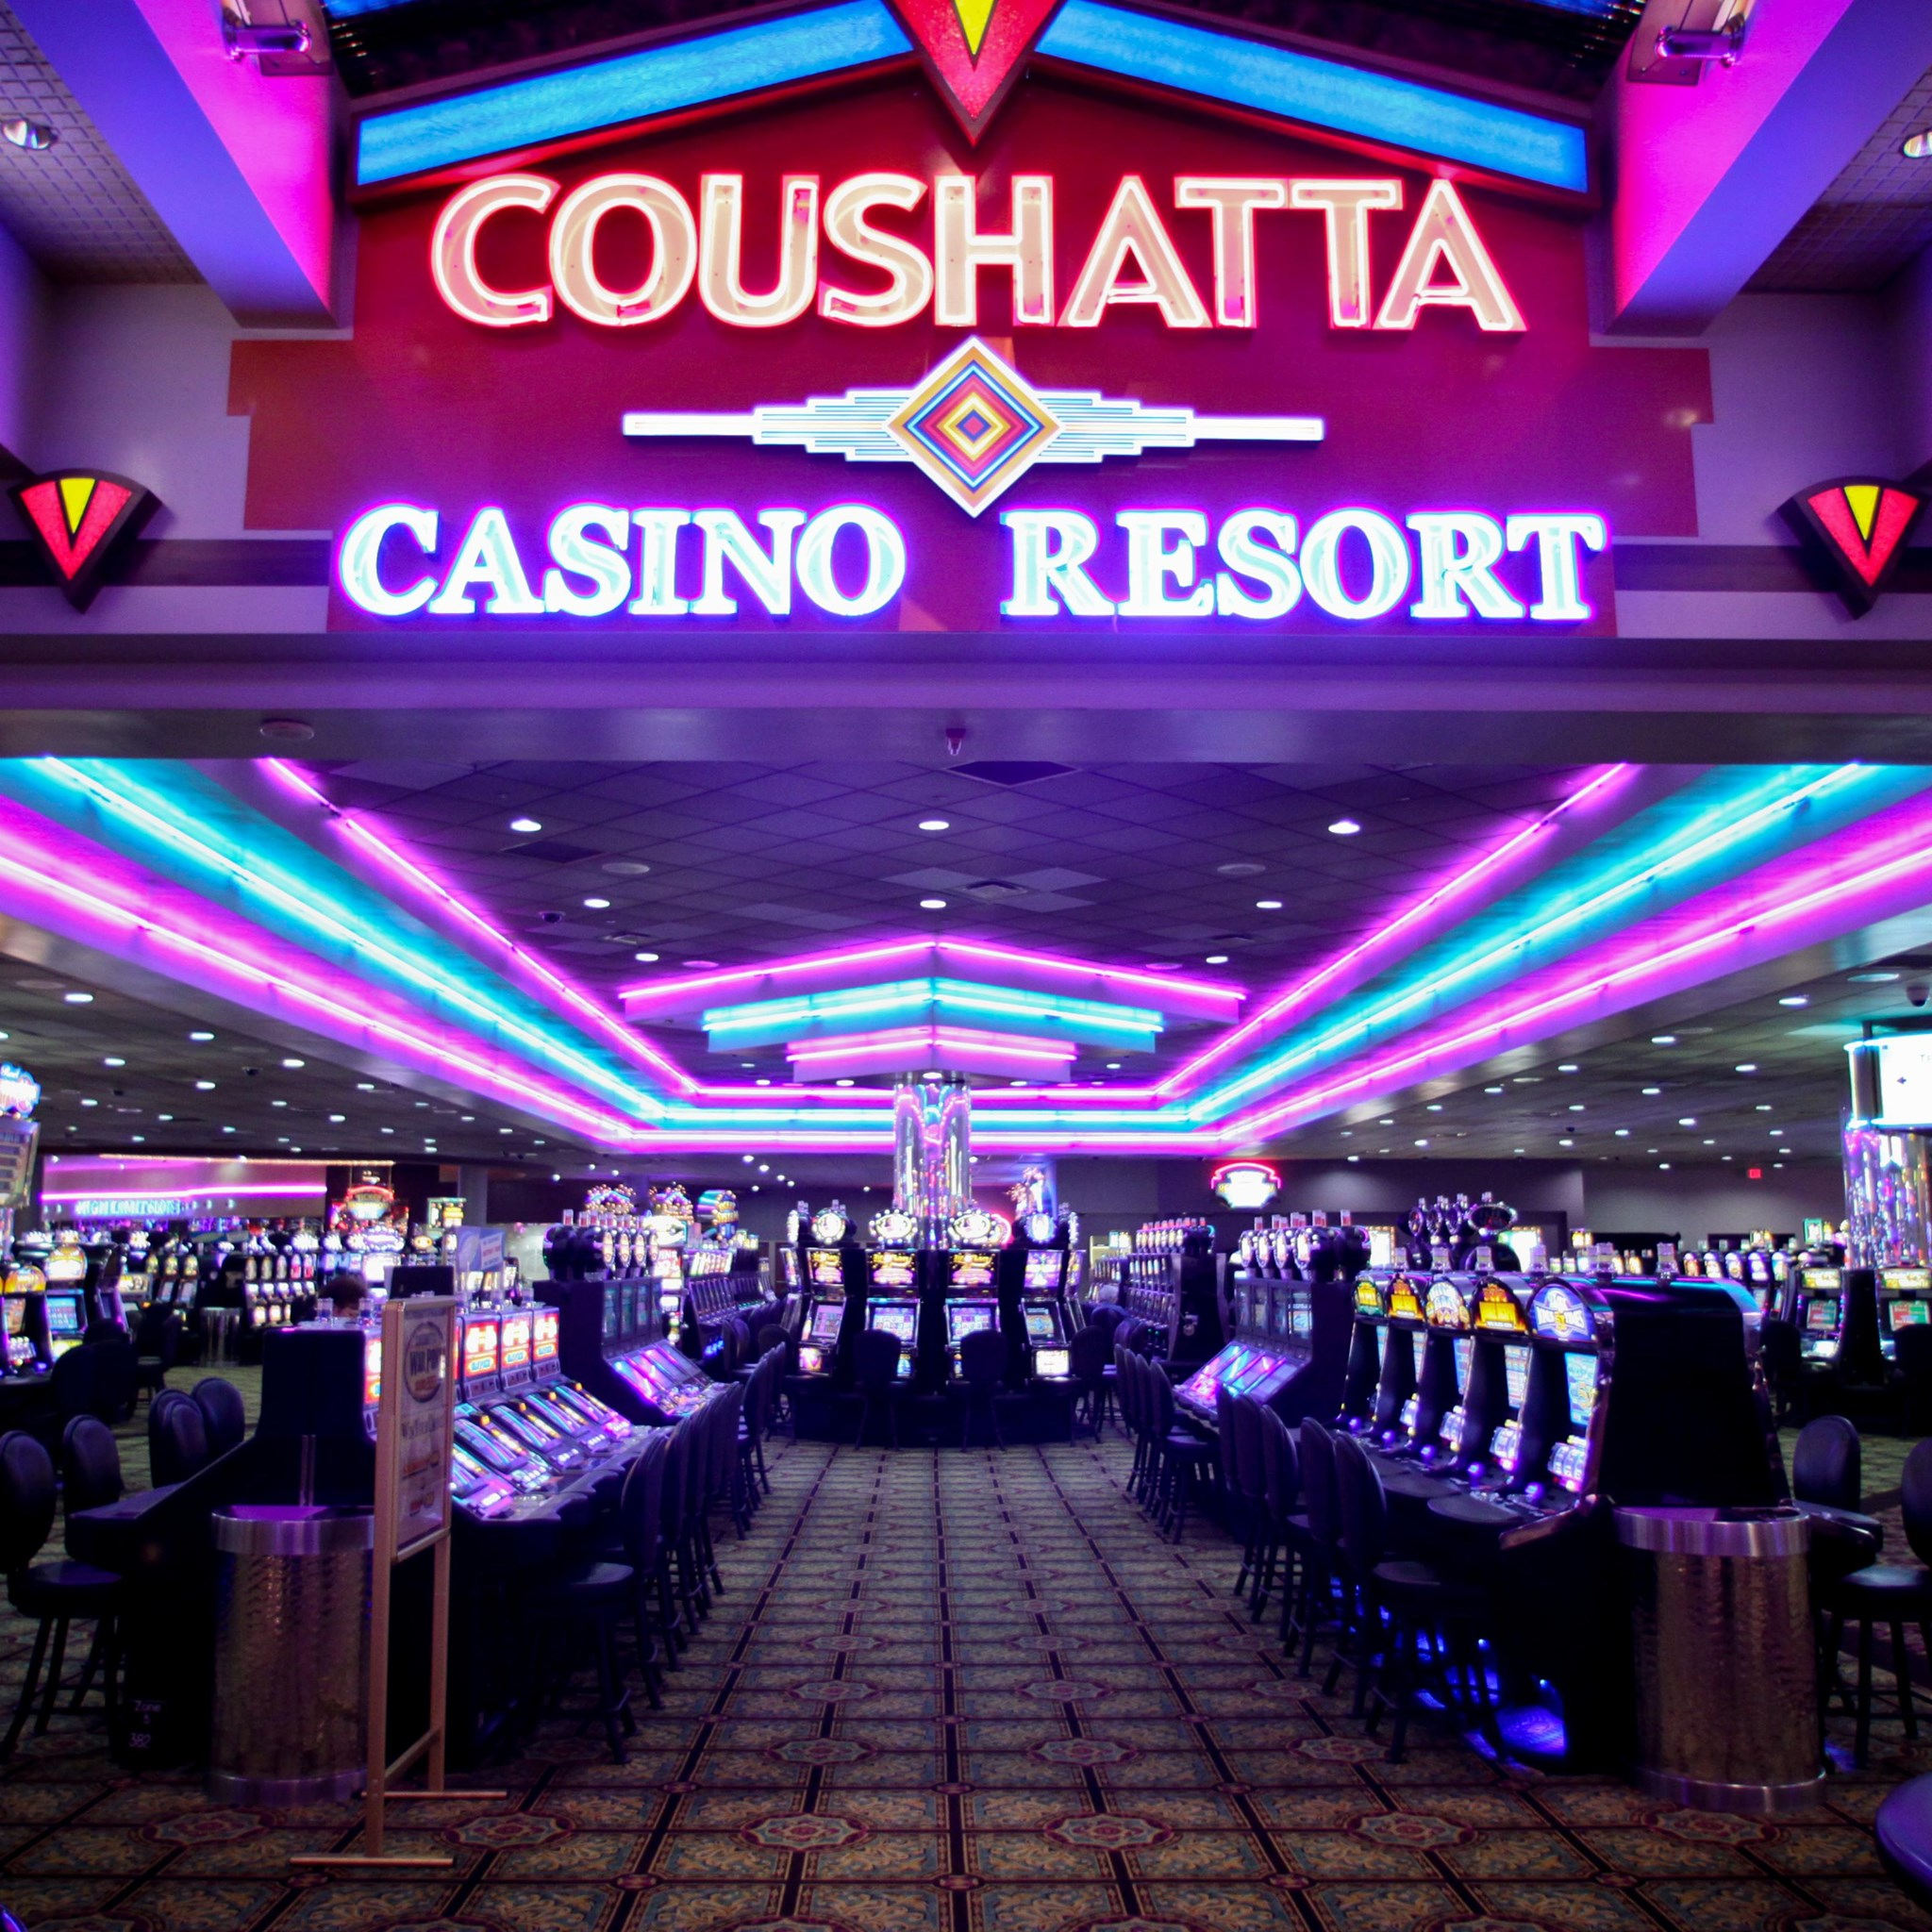 Caushatta casino flyers penguins game 2